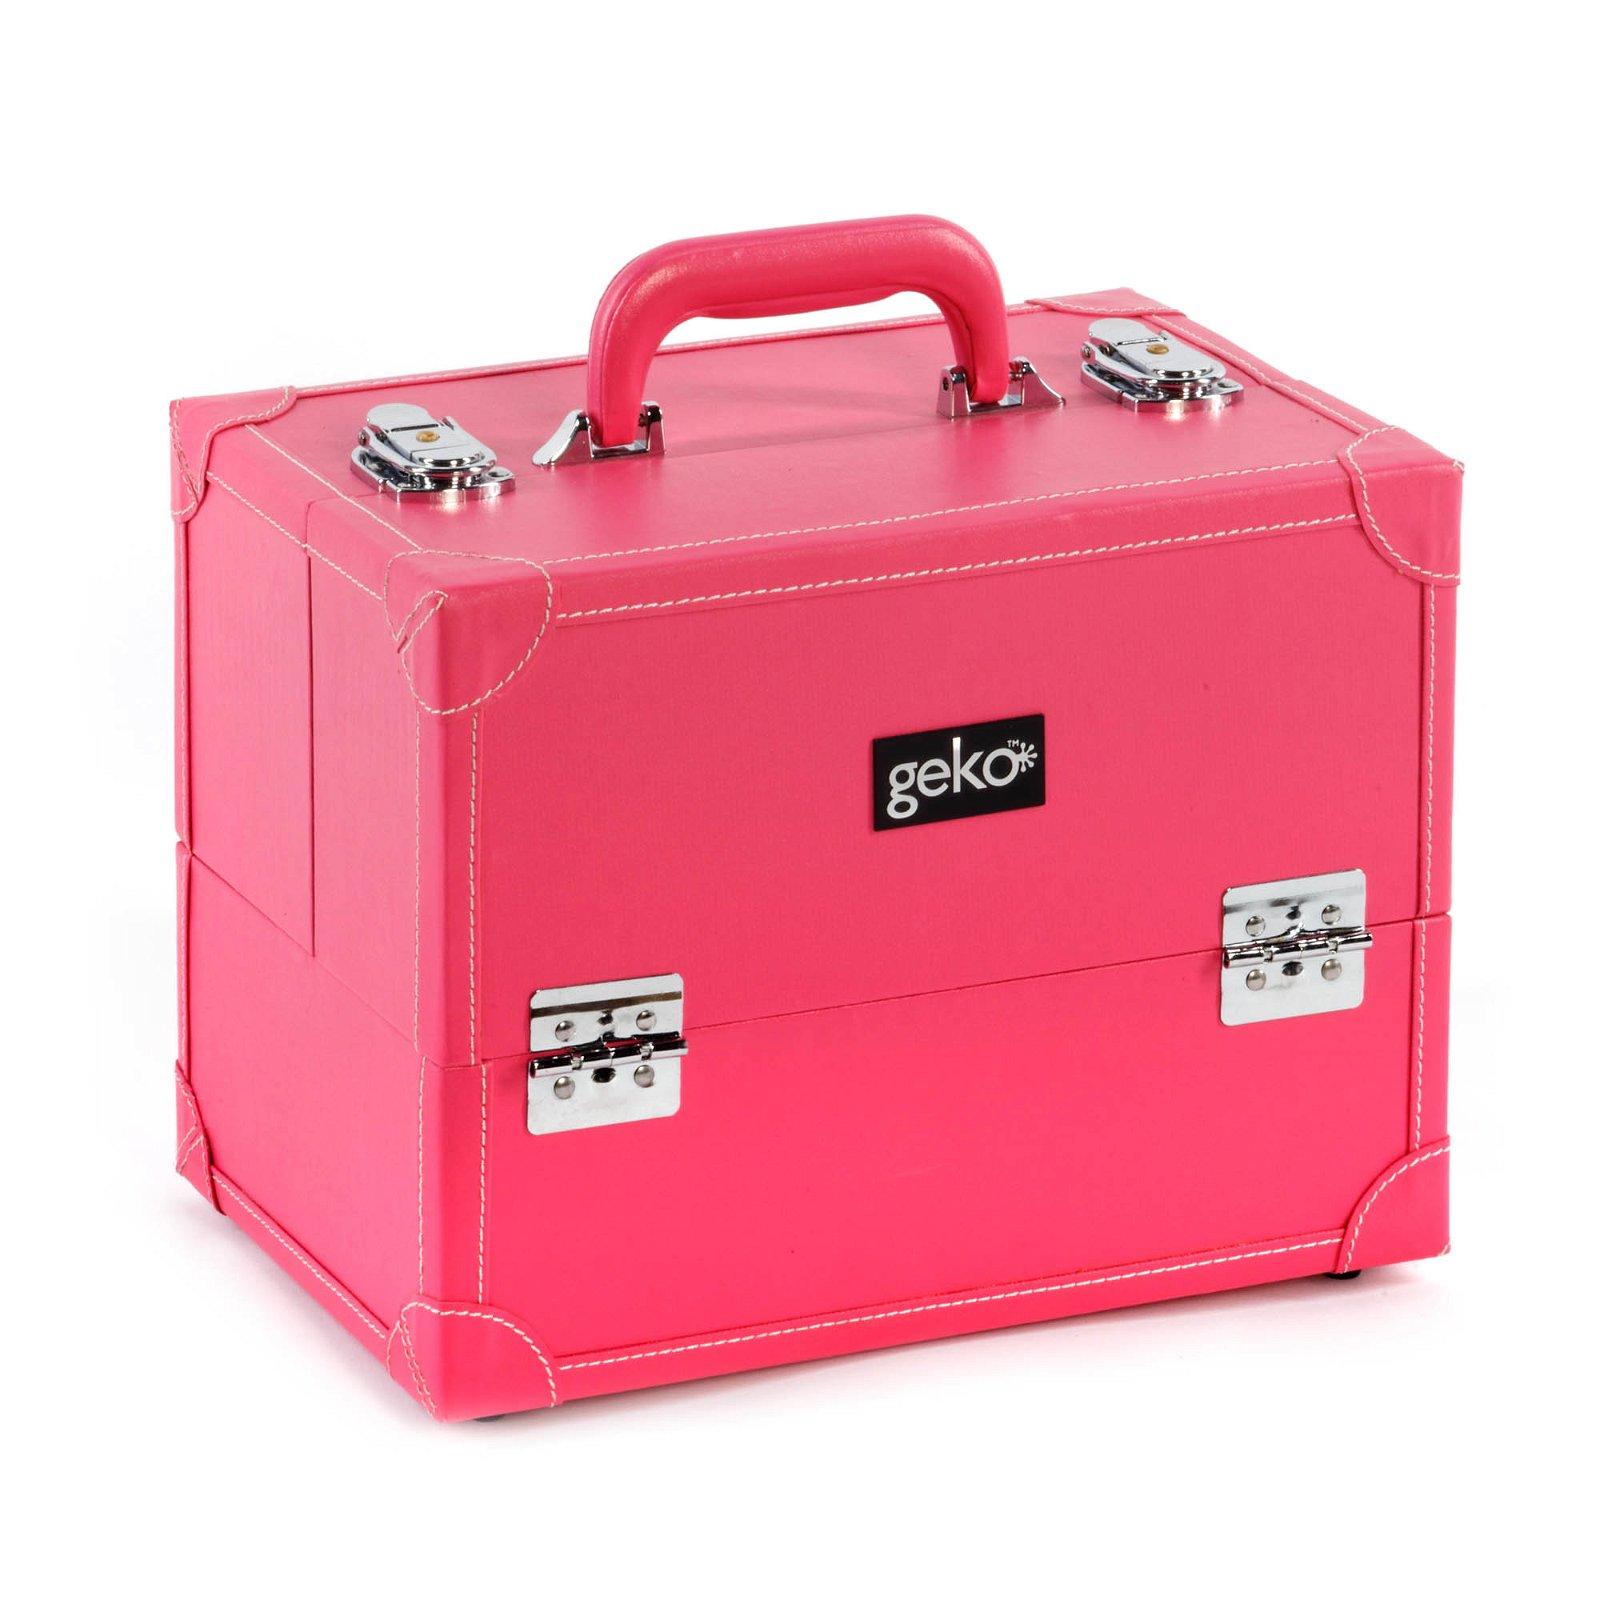 Vanity Case / Makeup Box Box Pink Faux Leather